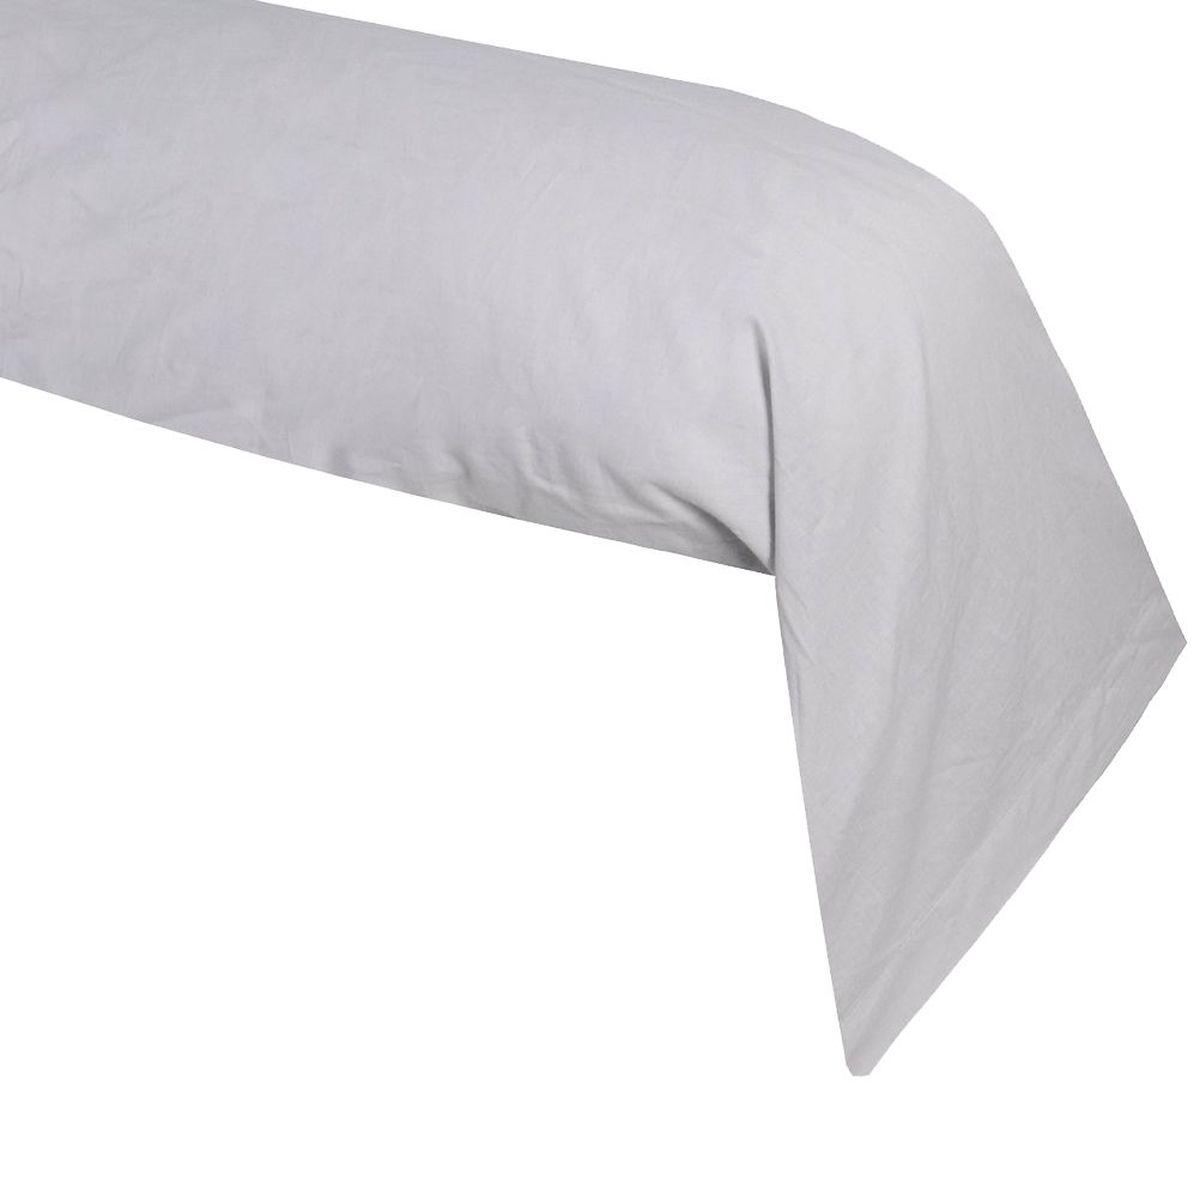 une taie de traversin gris perle alicia 45 x 185 cm. Black Bedroom Furniture Sets. Home Design Ideas